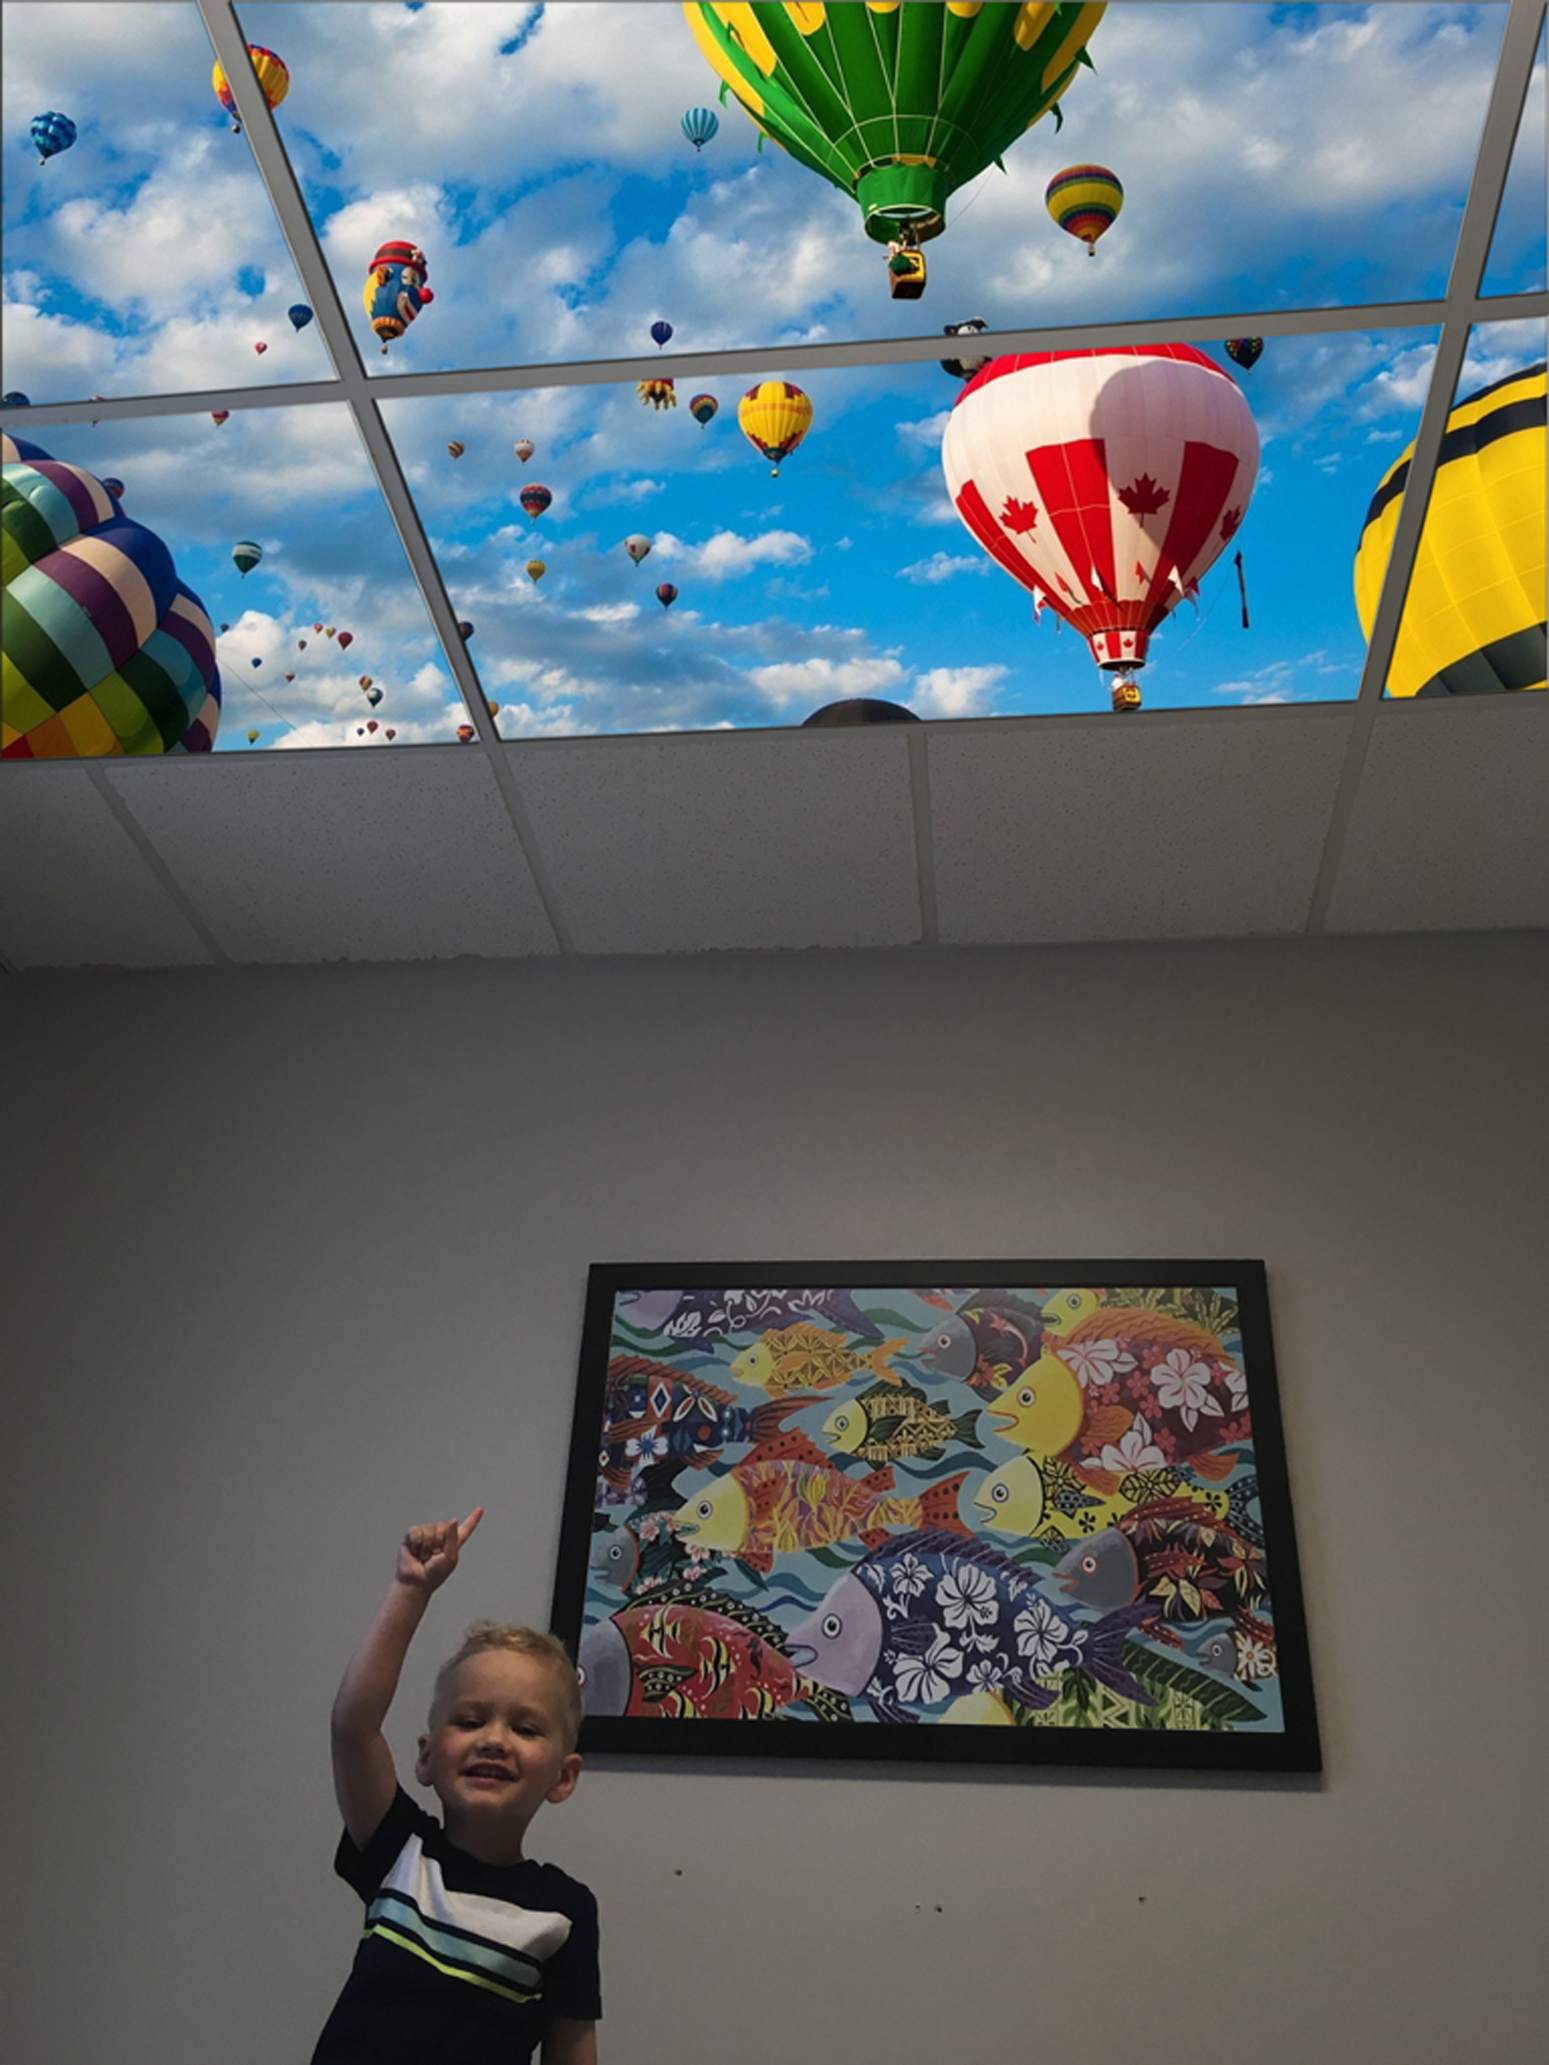 pediatric treatment room led skylight